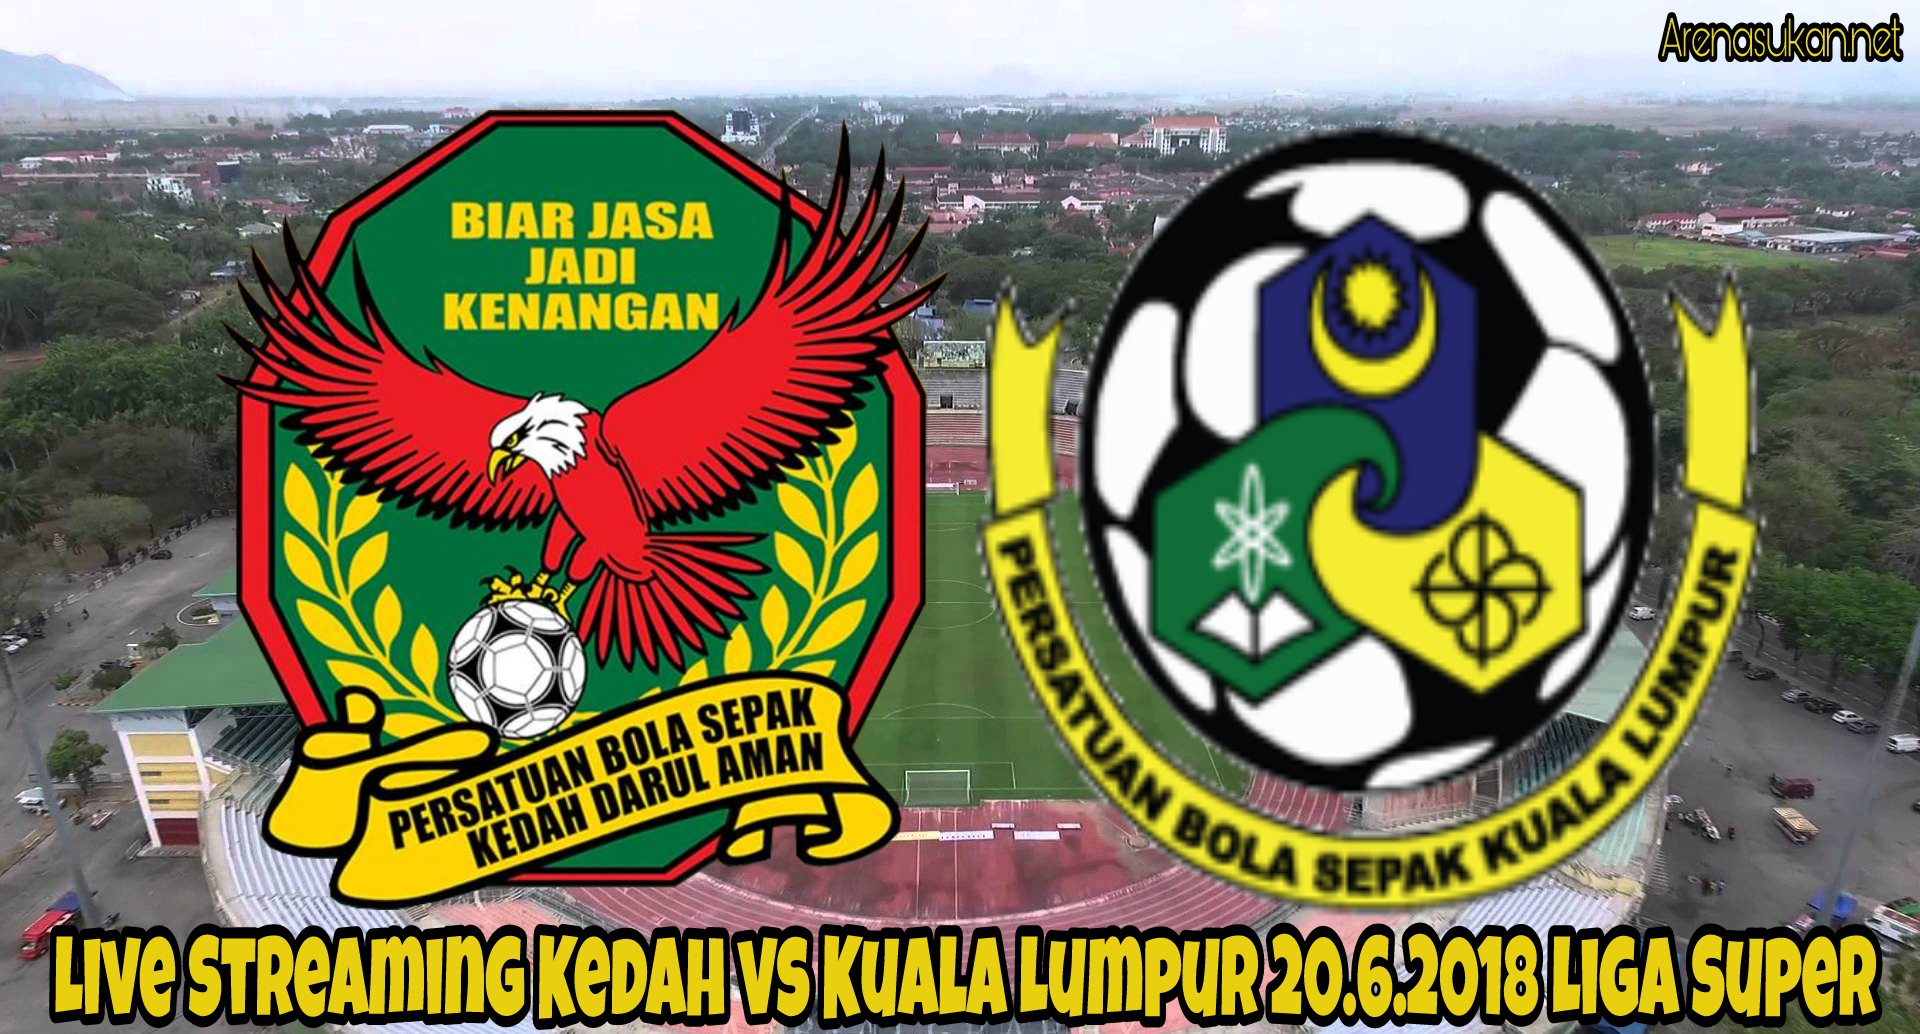 Live Streaming Kedah vs Kuala Lumpur 20.6.2018 Liga Super